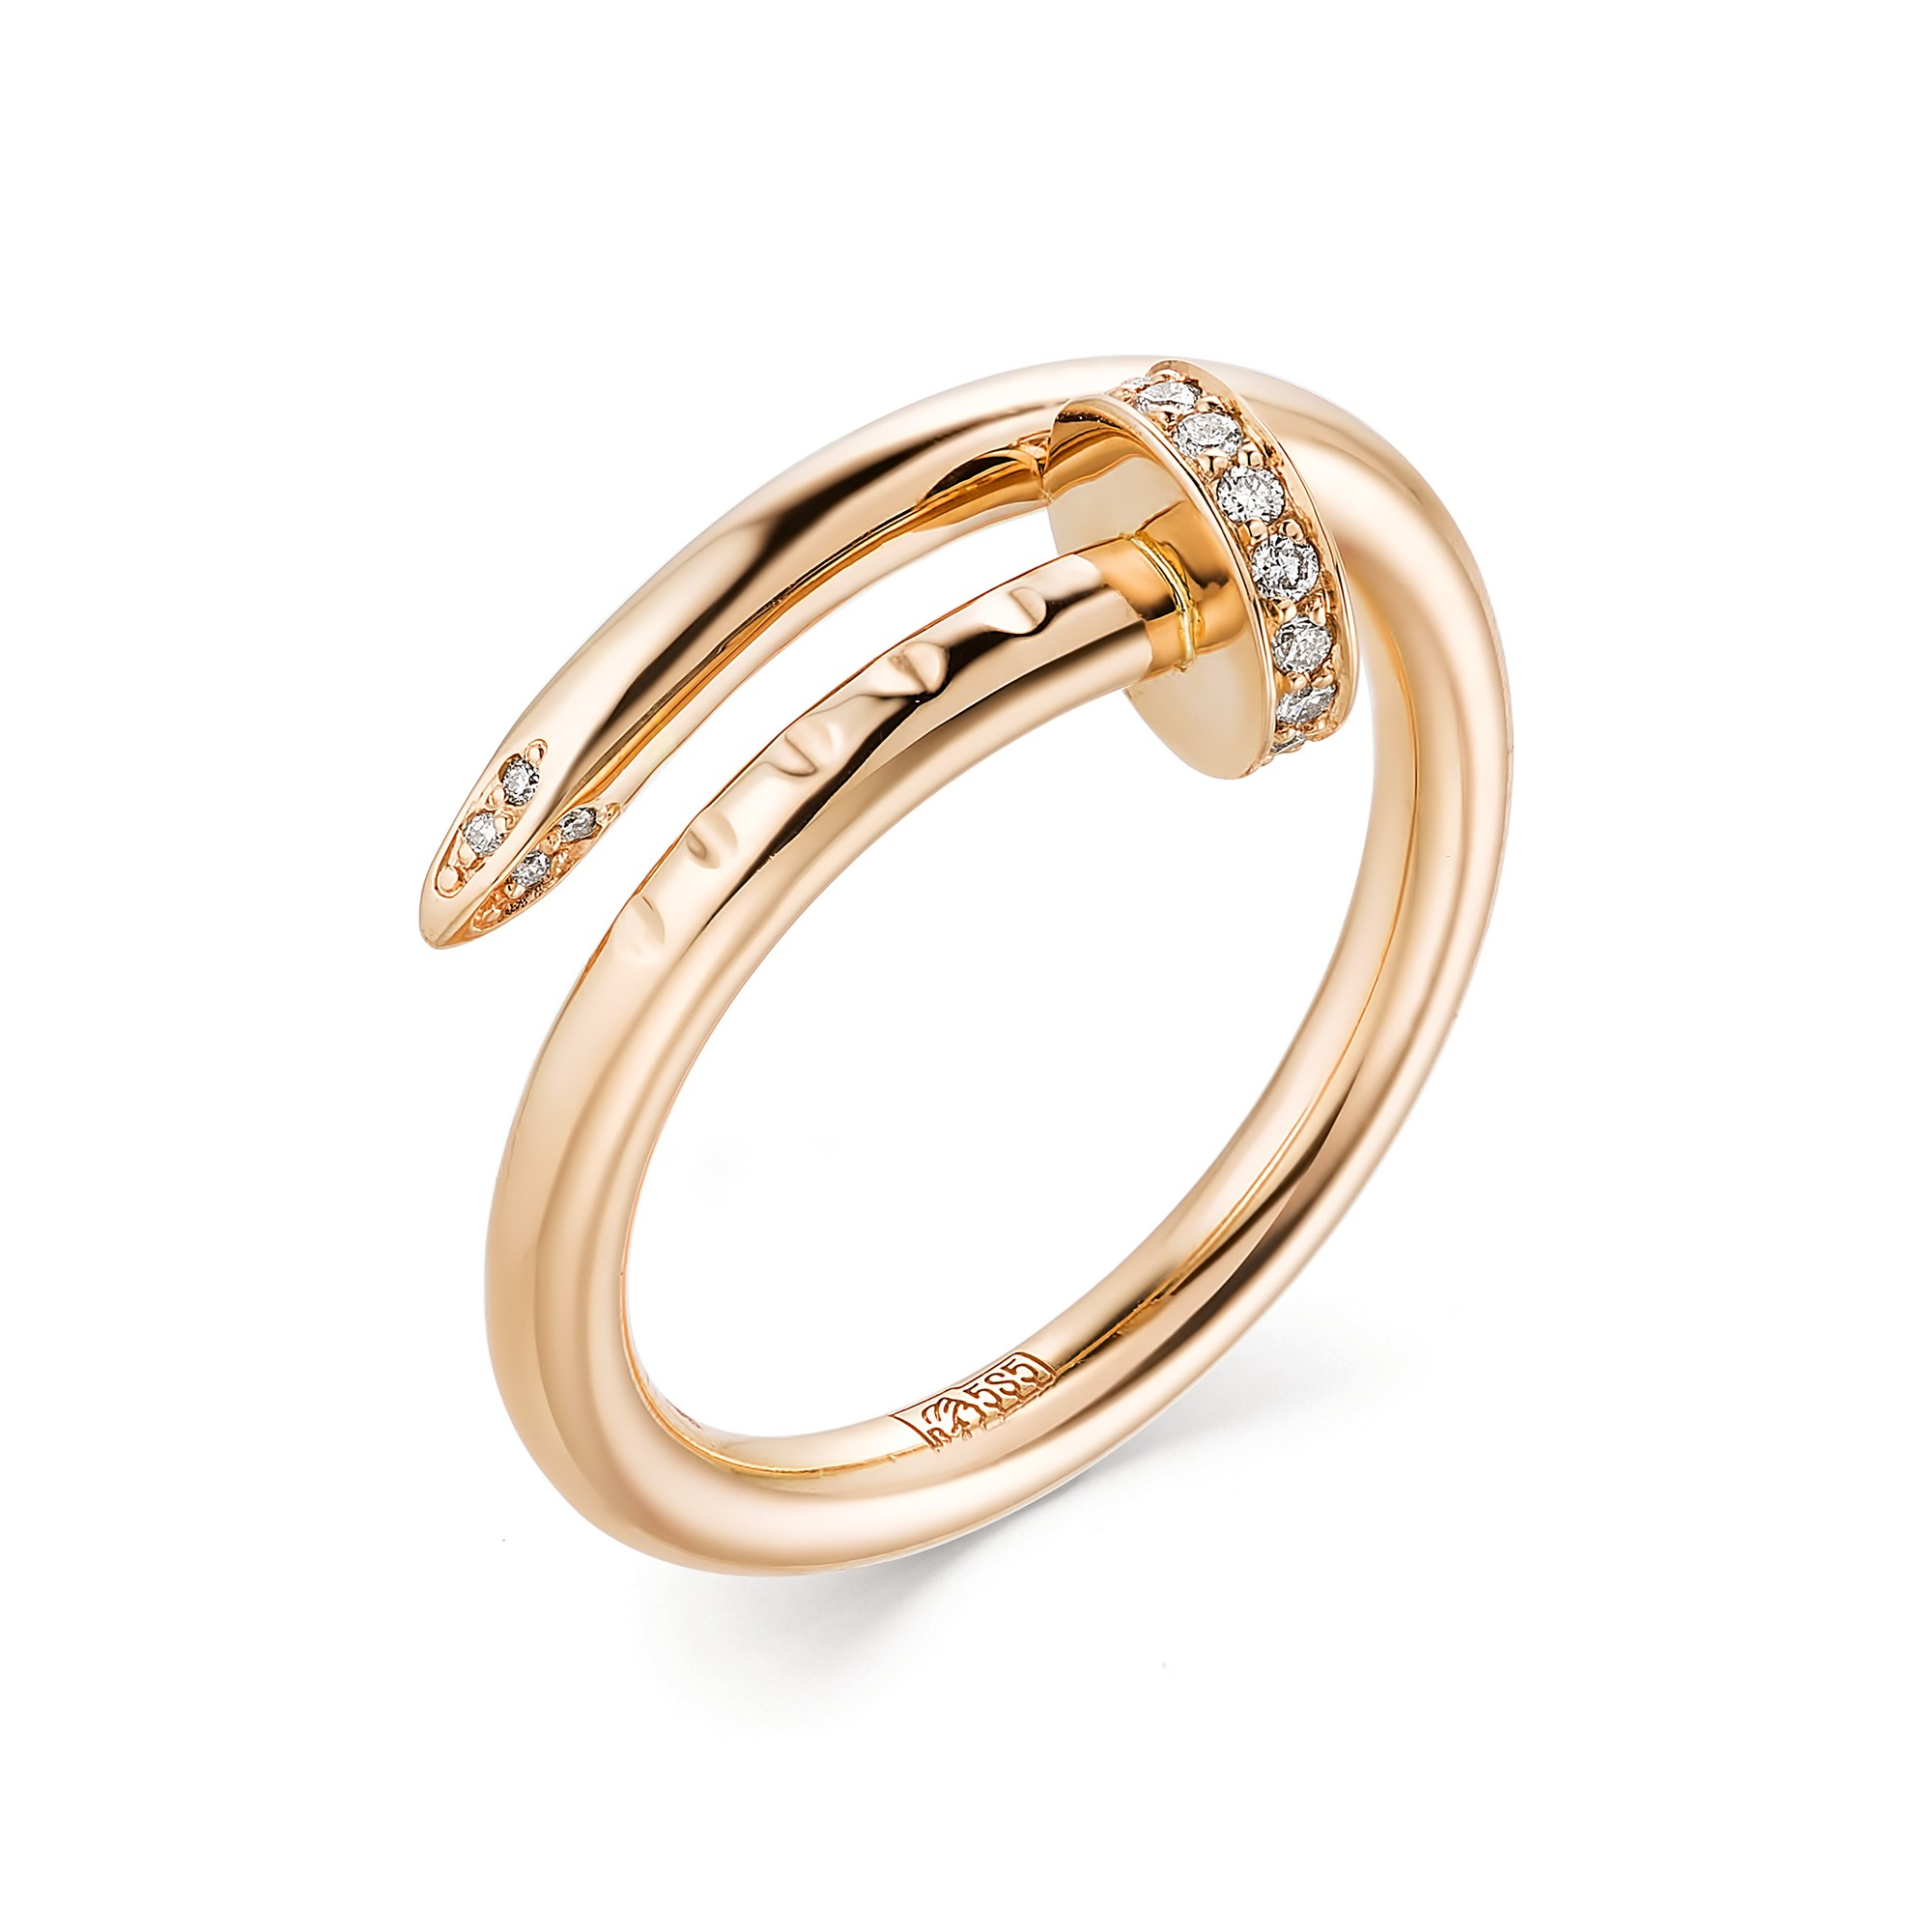 картинка кольцо 12998-100 13 бриллиант круг 57 0,091 120-200 4/5а, 8 бриллиант круг 57 0,022 200-400 4/5а 12998-100